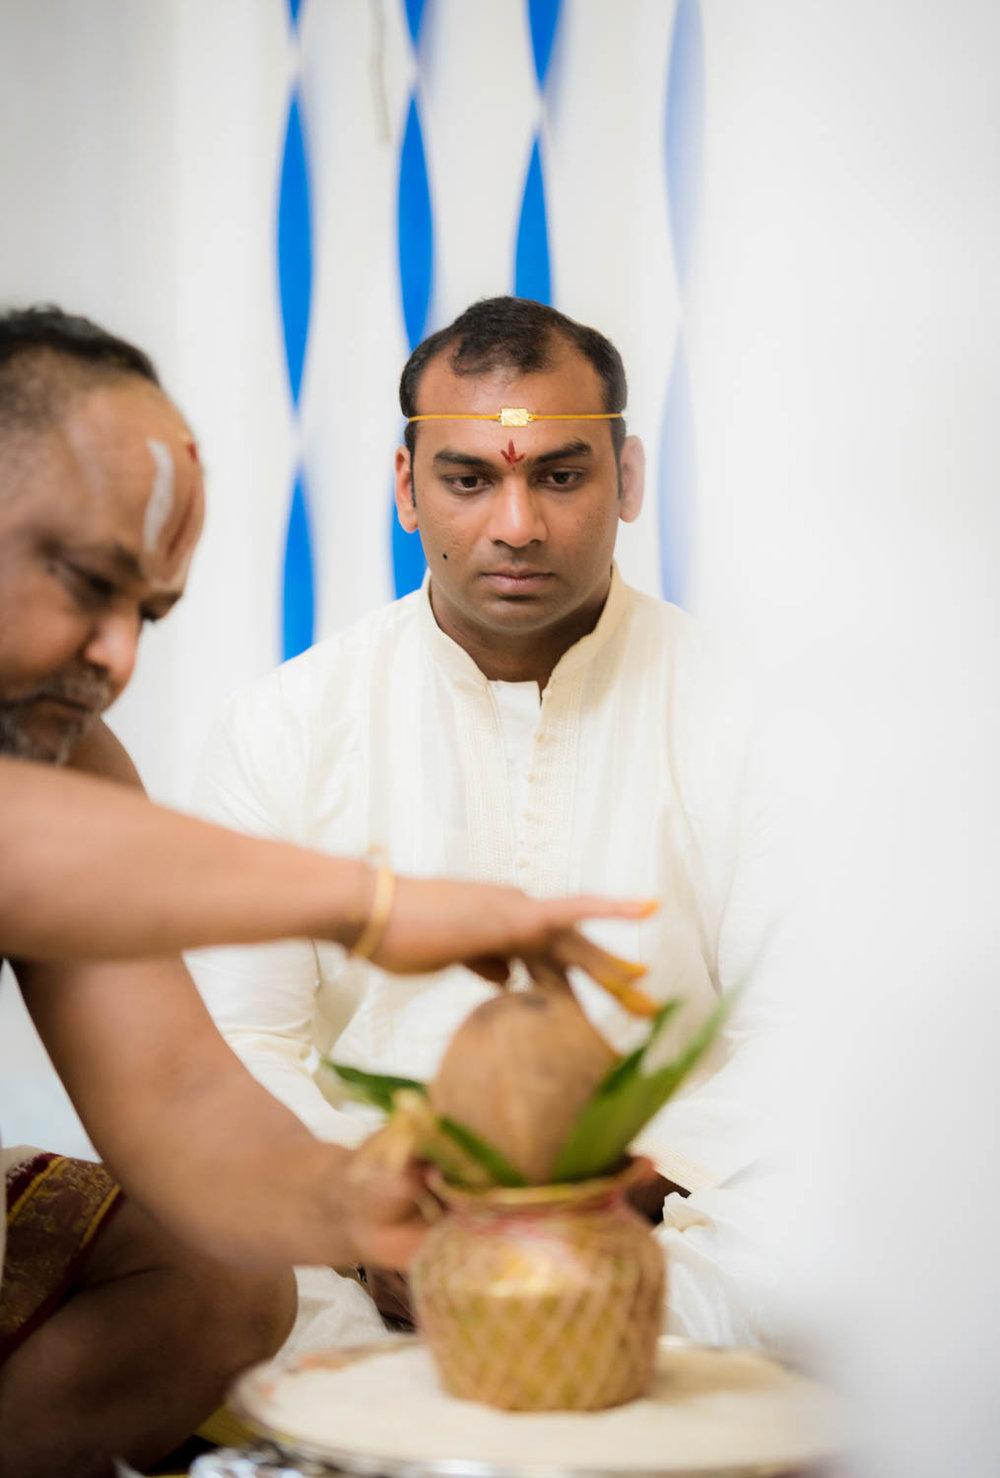 ecaterina-chandu-indian-wedding11.jpg